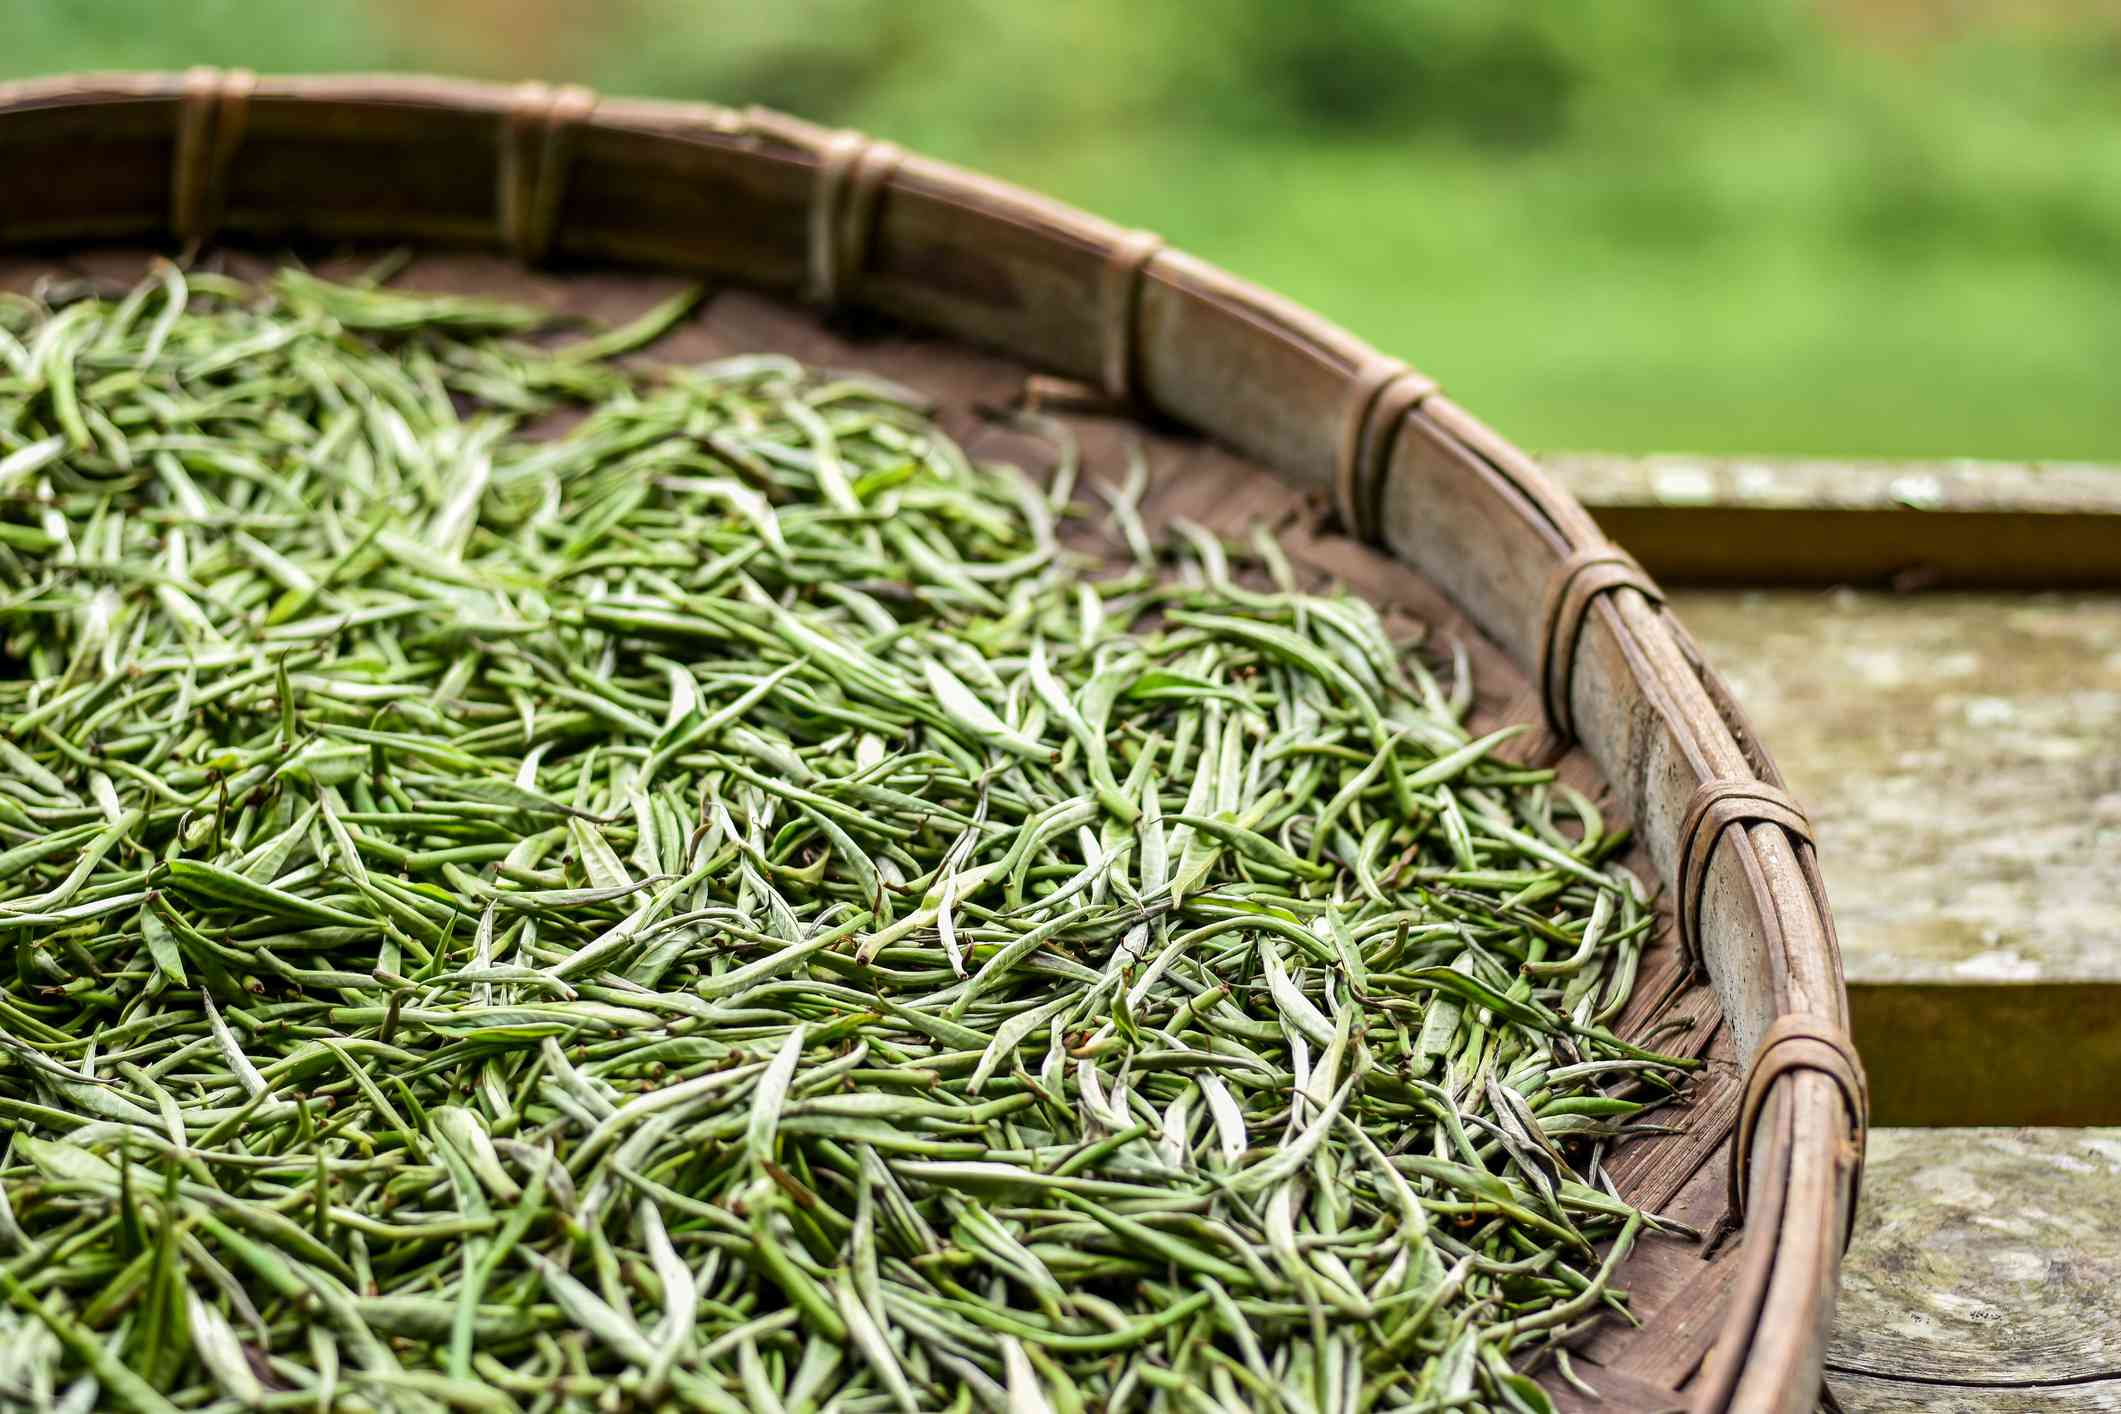 Harvested white tea leaves